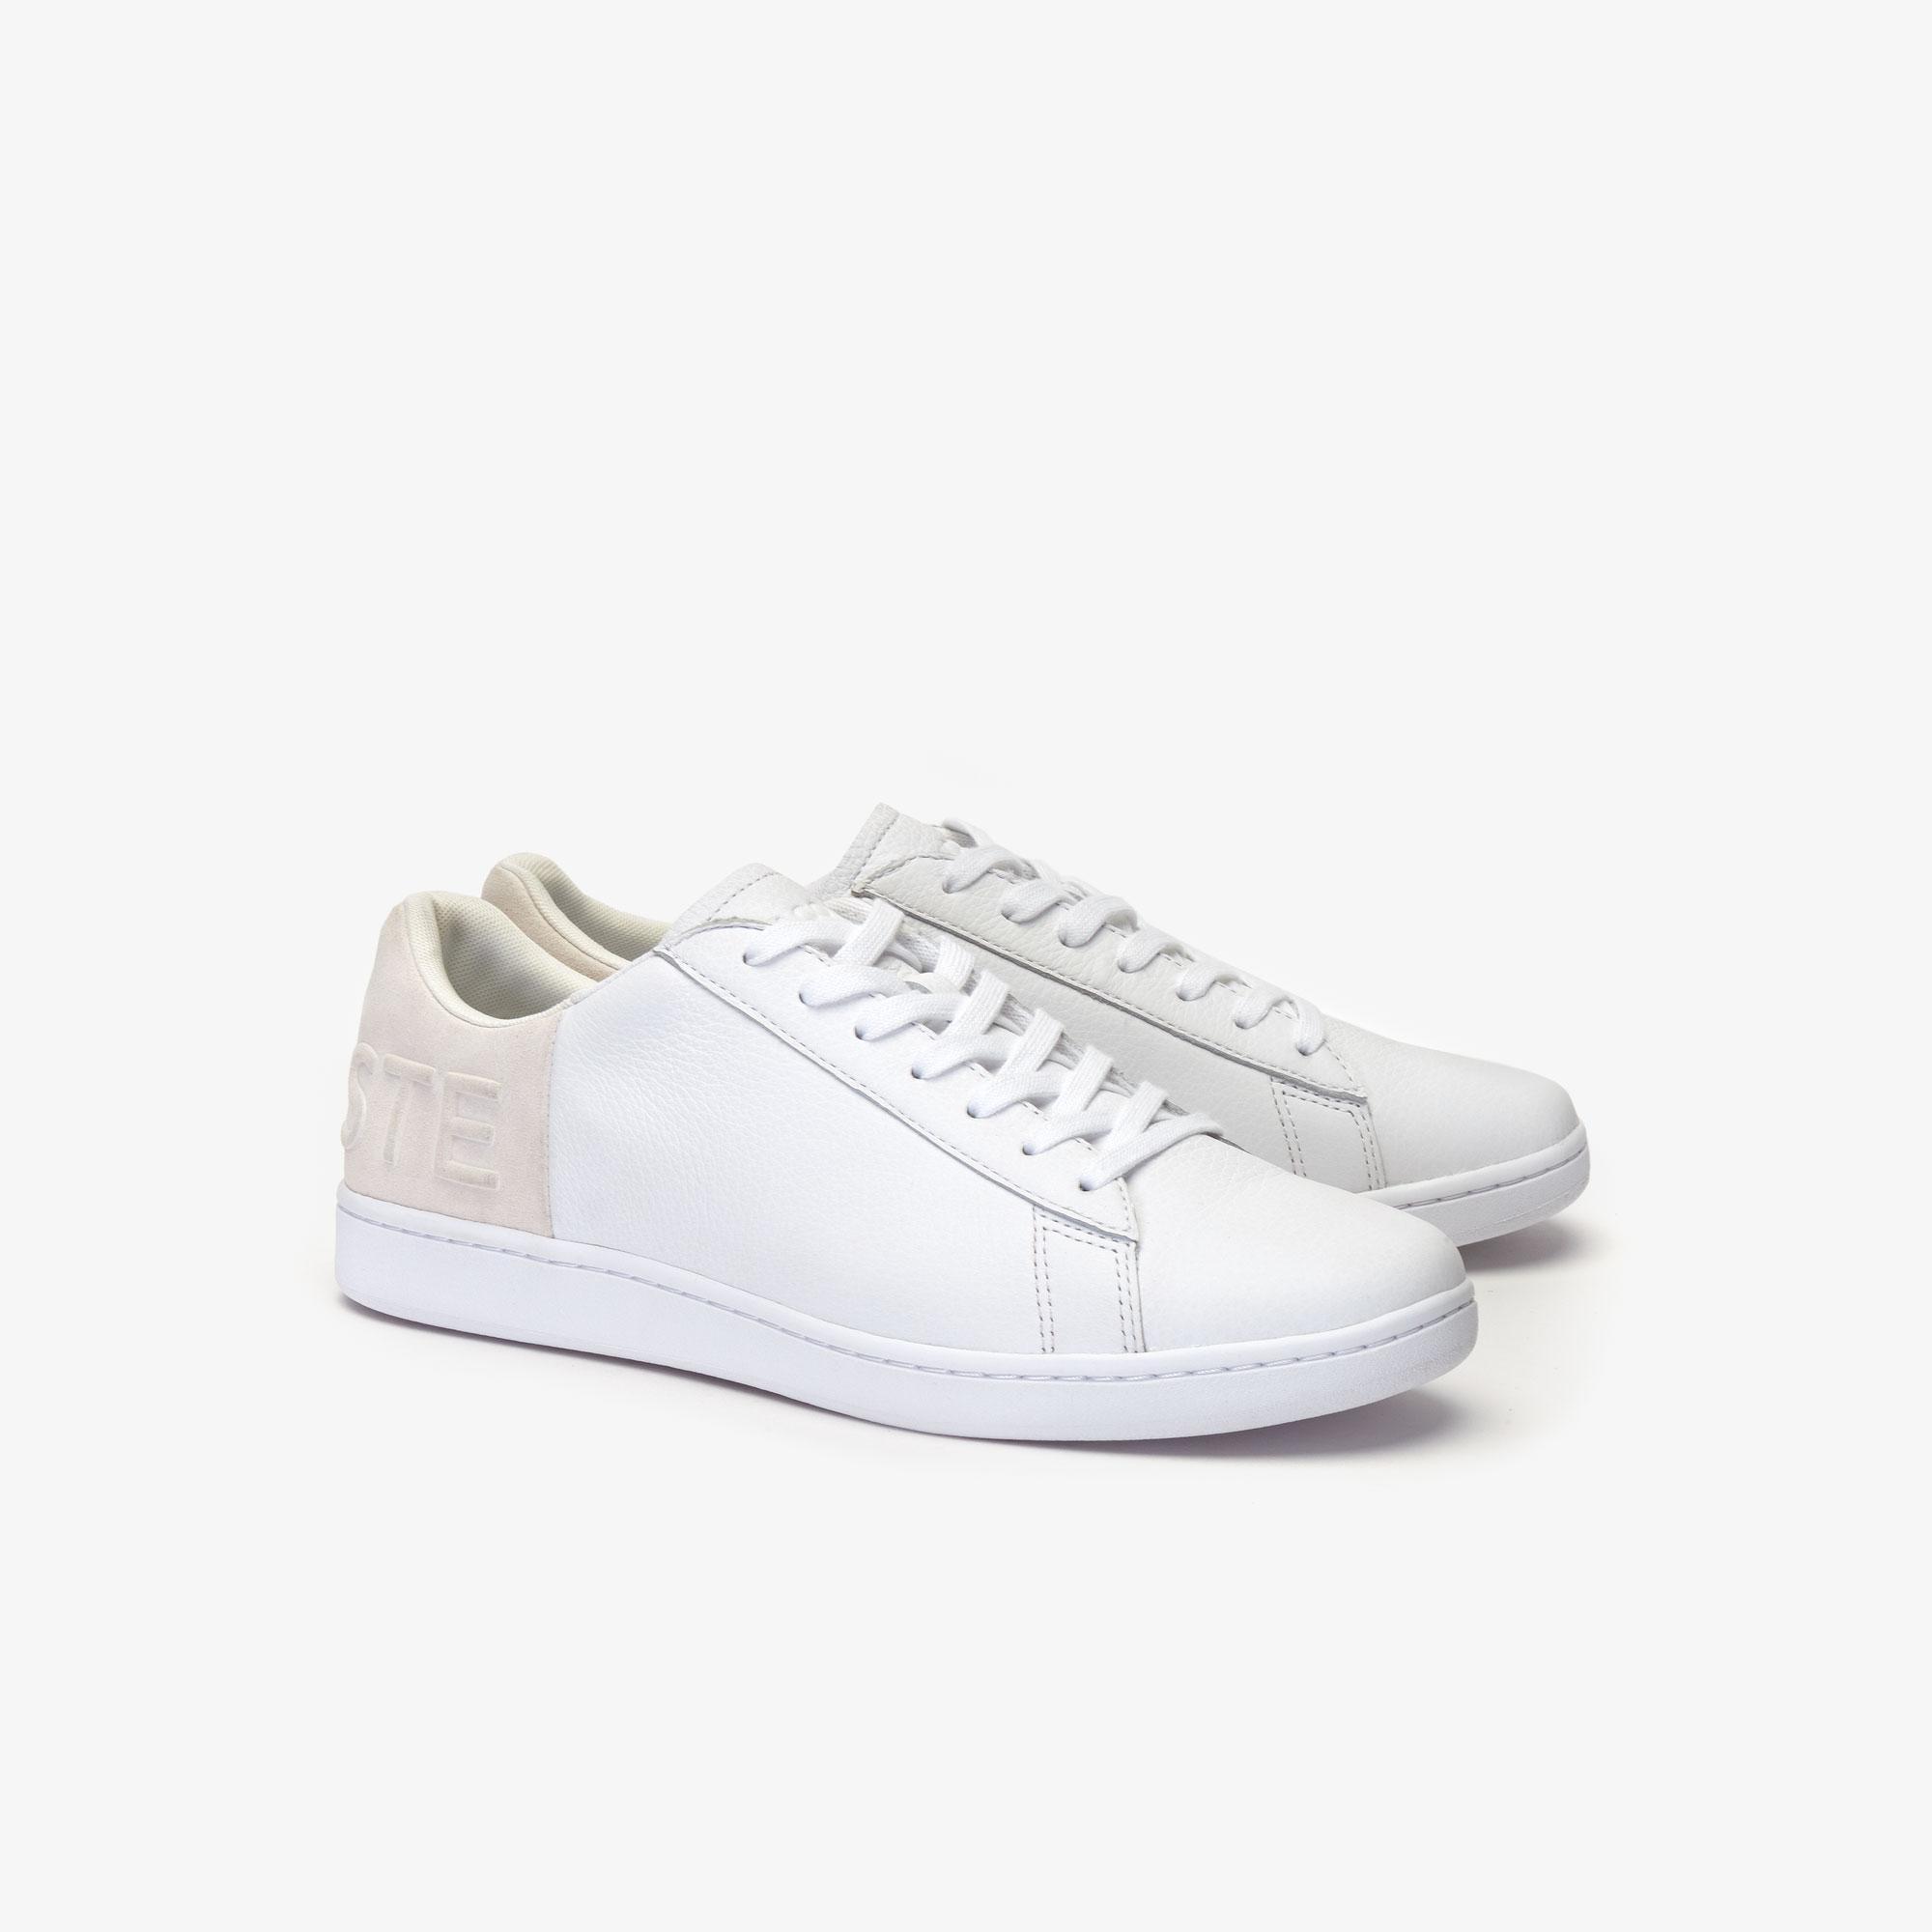 Lacoste Carnaby Evo 419 2 Sma Erkek Beyaz - Bej Sneaker